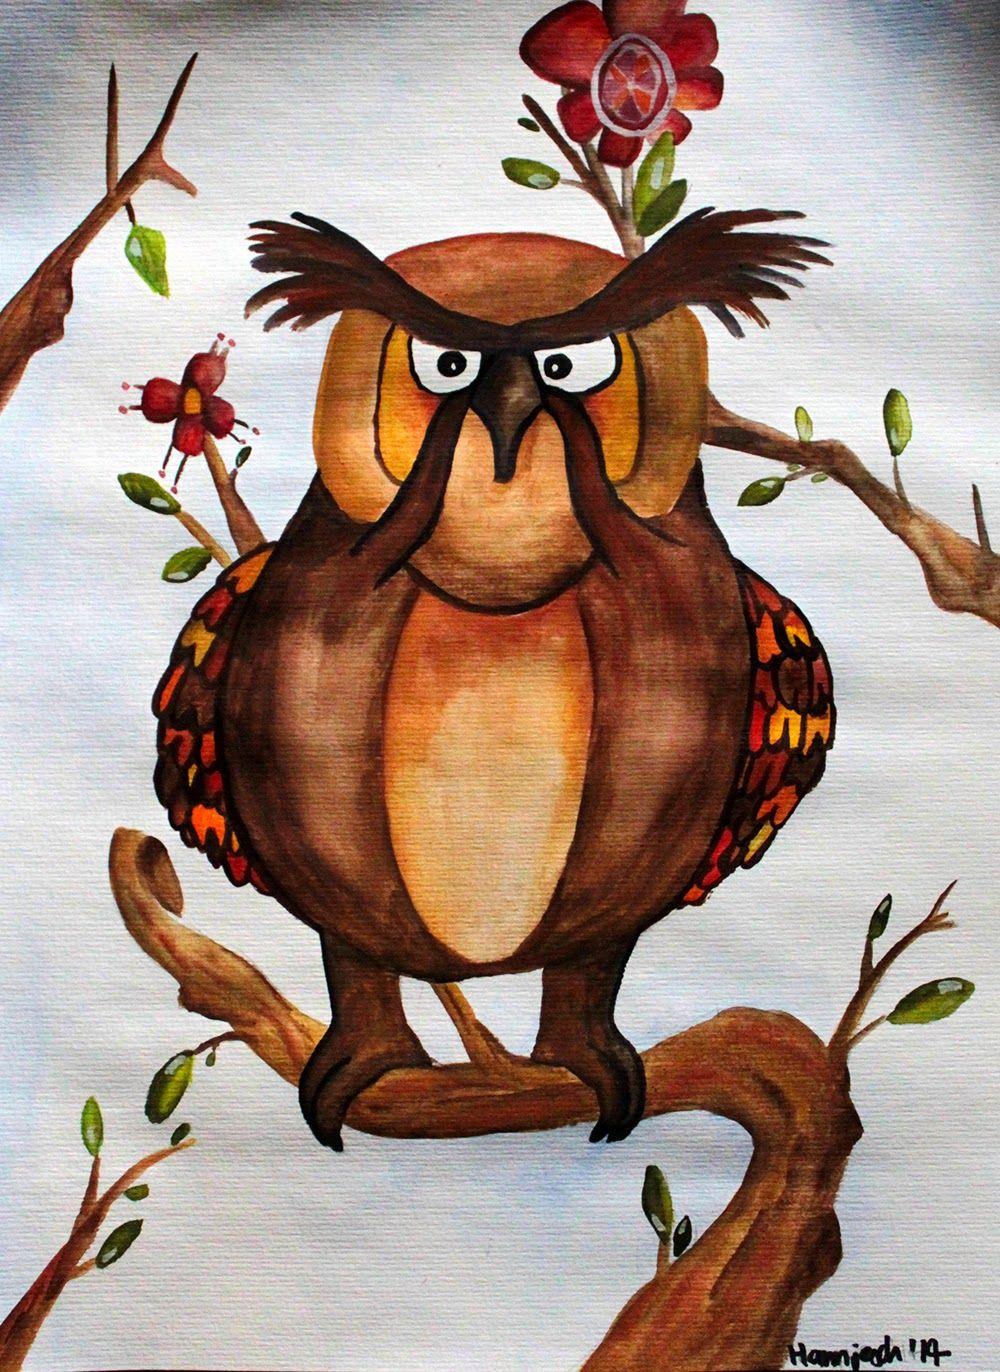 {Illusration} Grumpy Owl